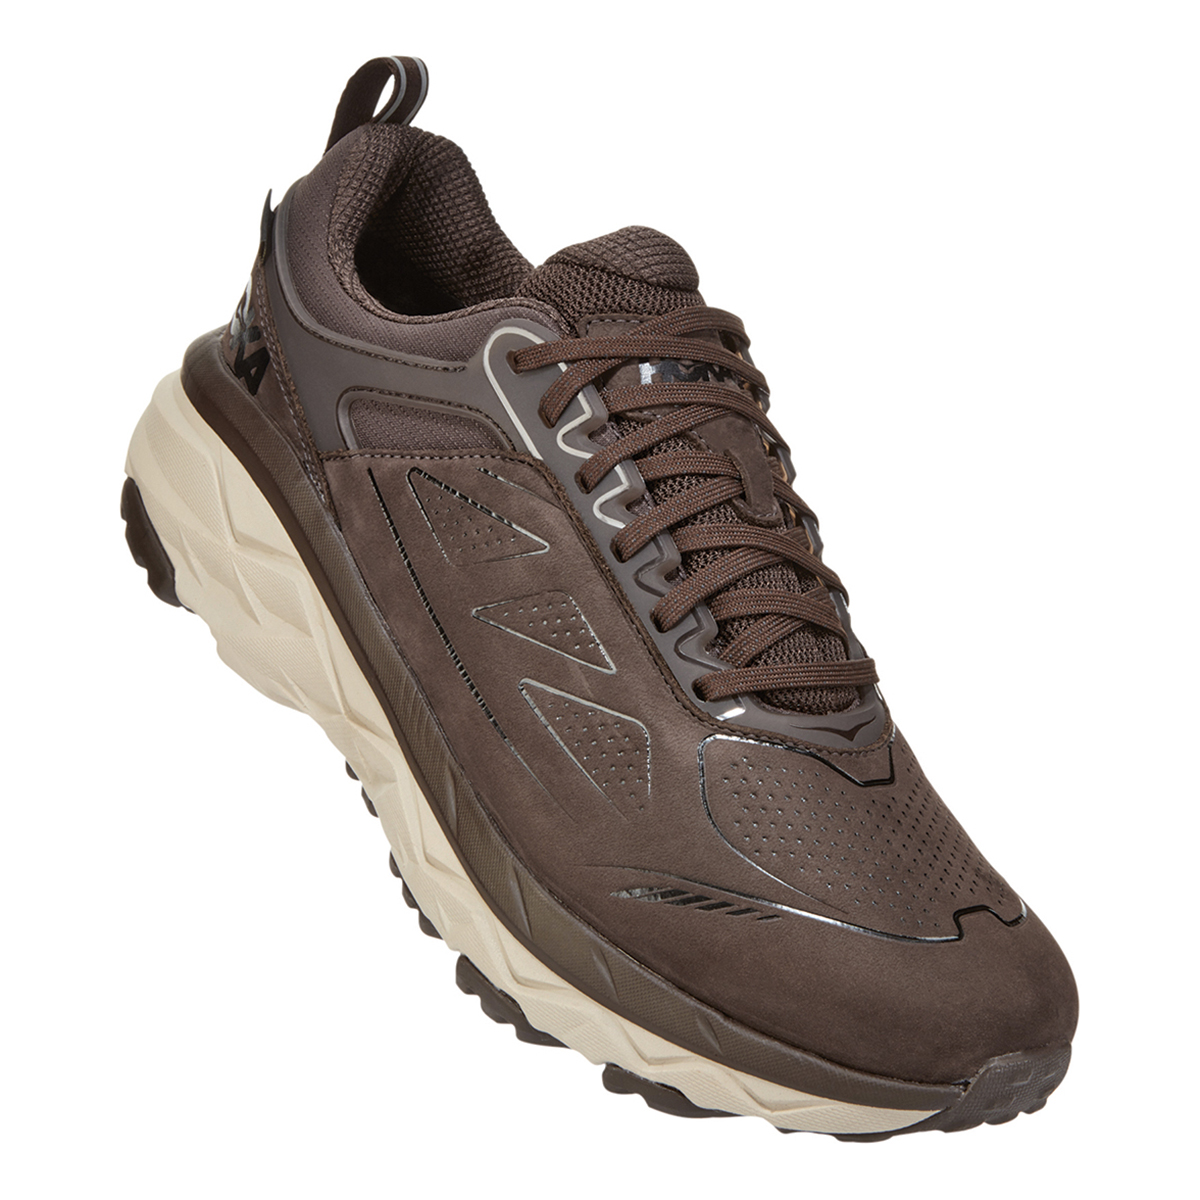 Men's Hoka One One Challenger Low Gore-Tex Trail Running Shoe - Color: Demitasse - Size: 7 - Width: Regular, Demitasse, large, image 5